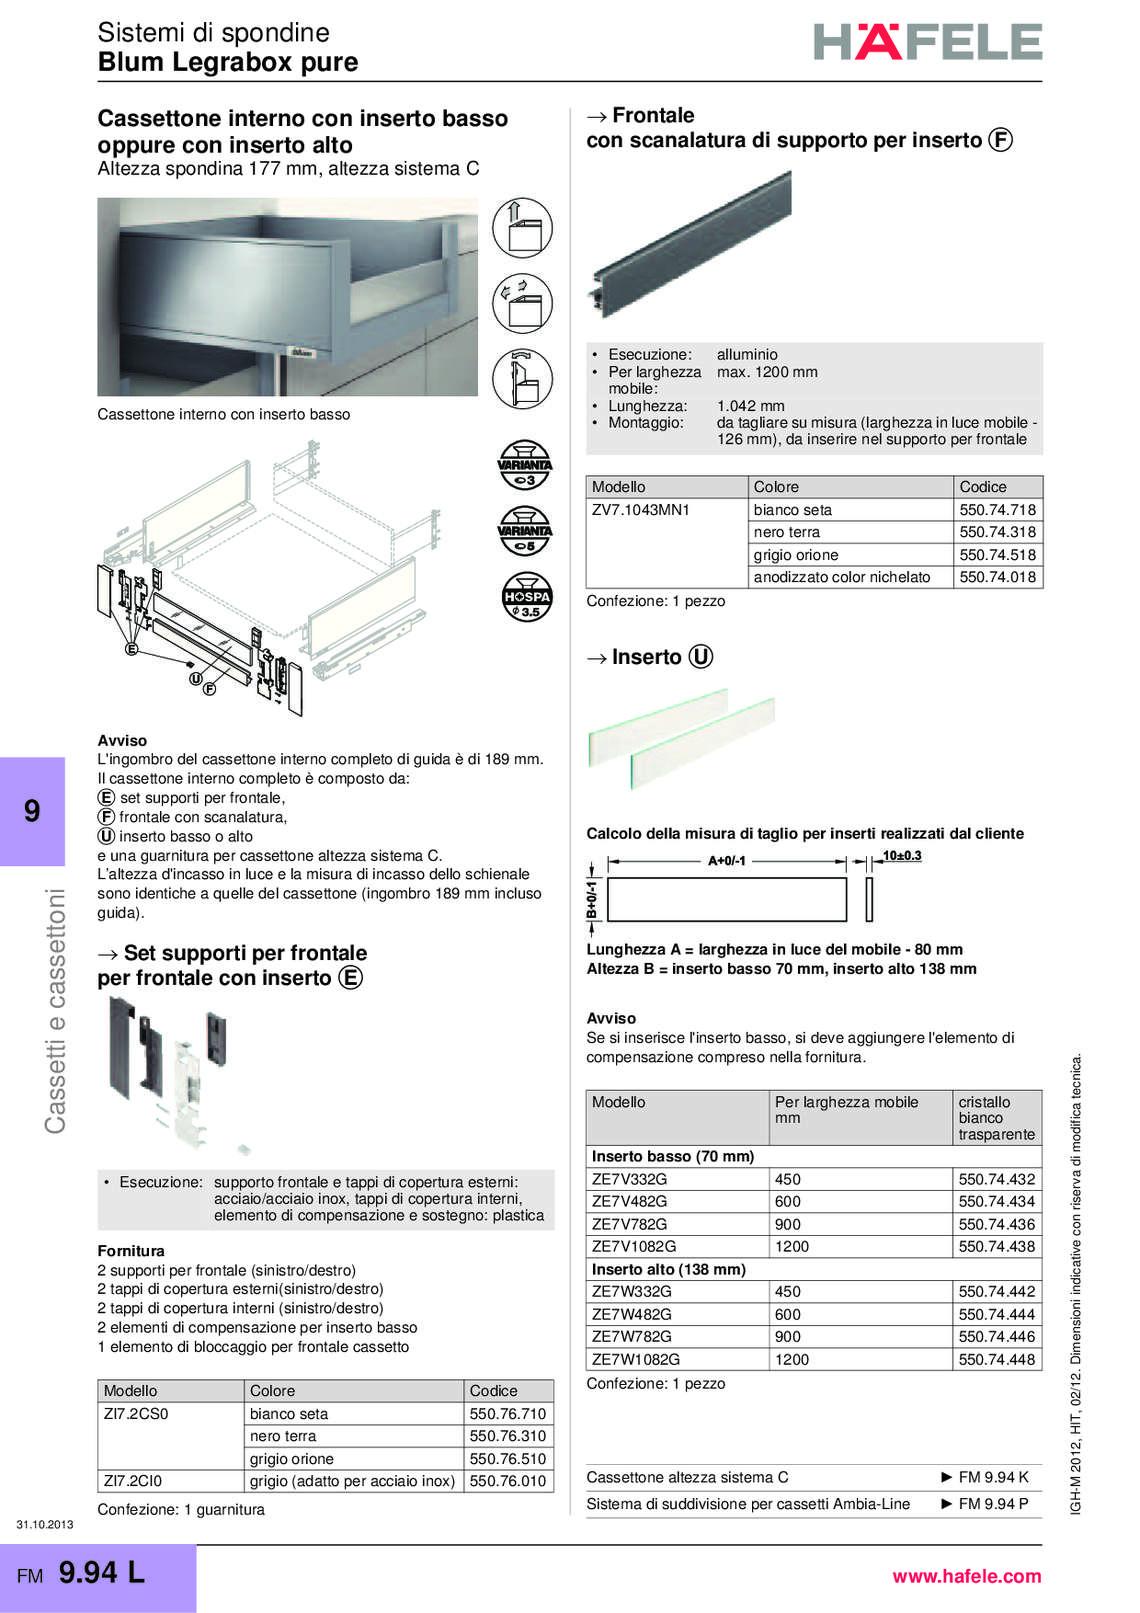 hafele-spondine-e-guide-per-mobili_40_129.jpg